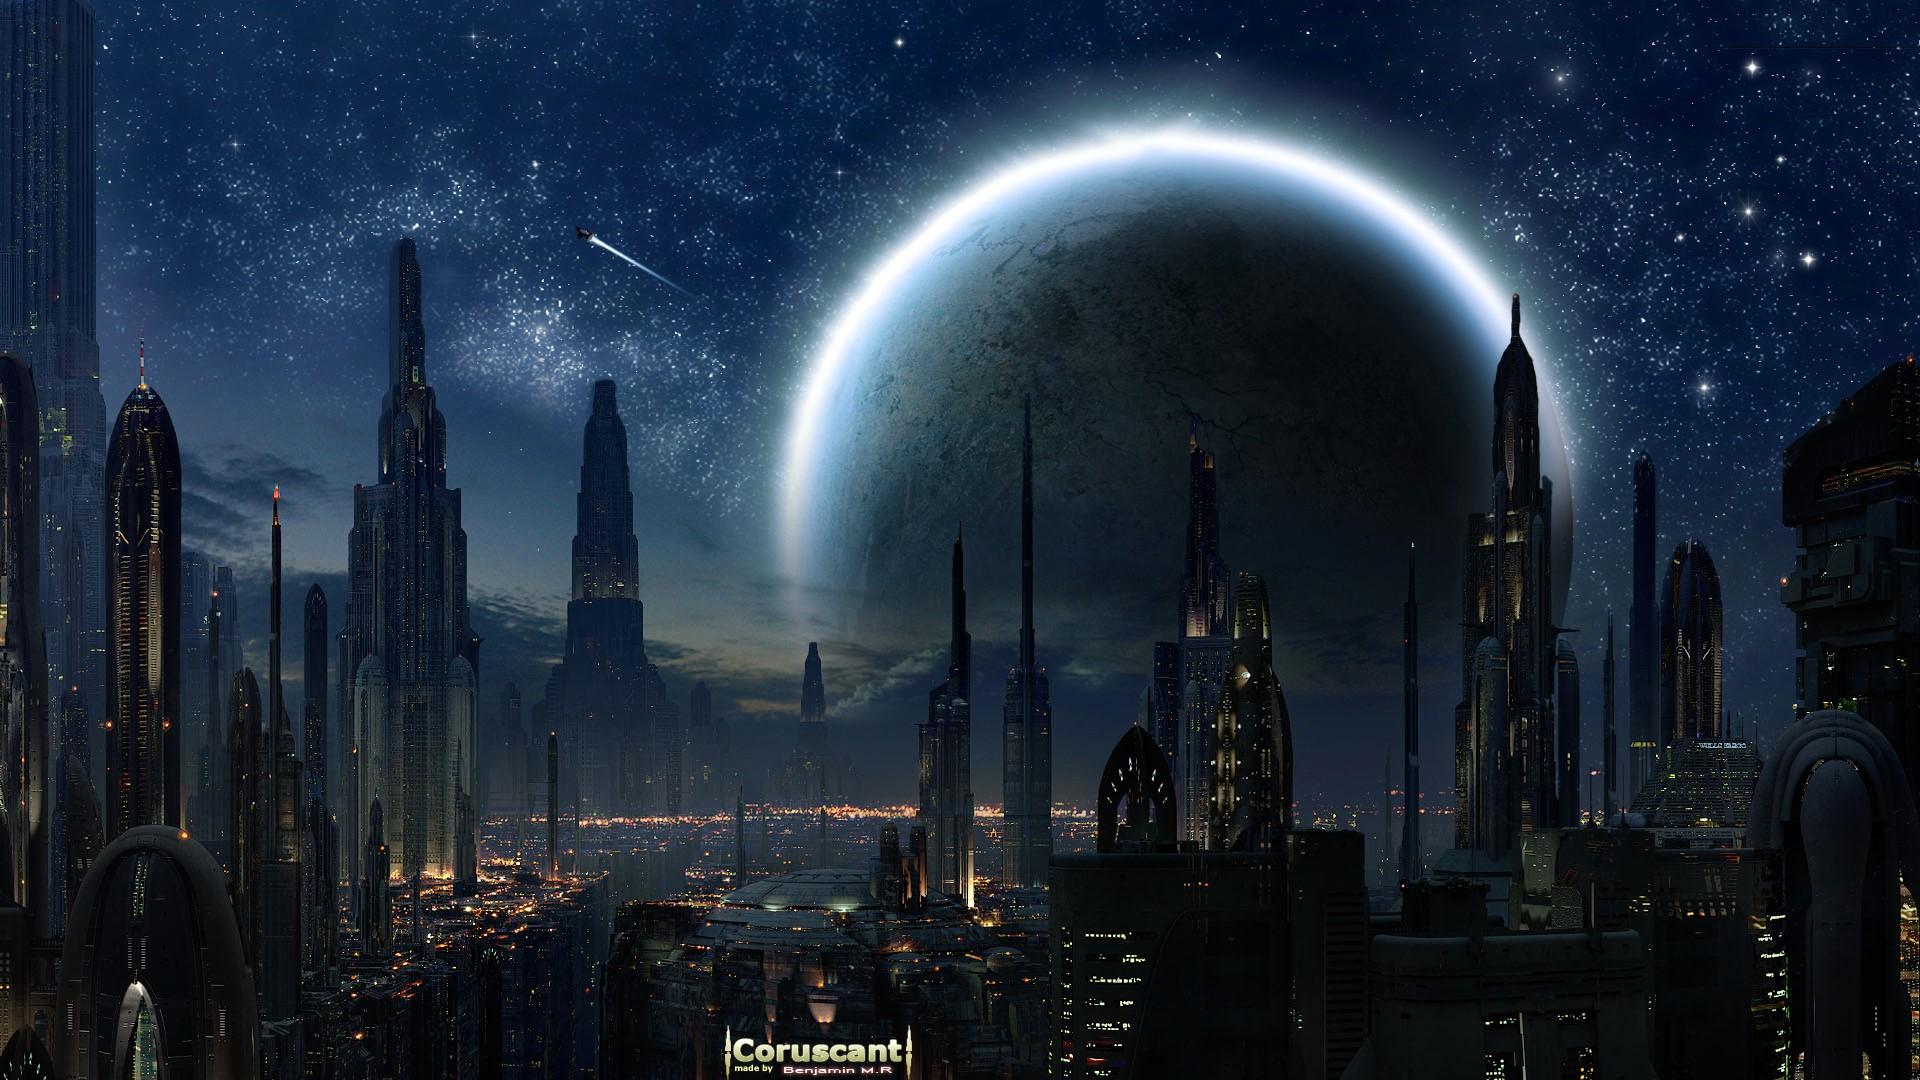 Star Wars Desktop Background 1920x1080 Posted By Samantha Cunningham